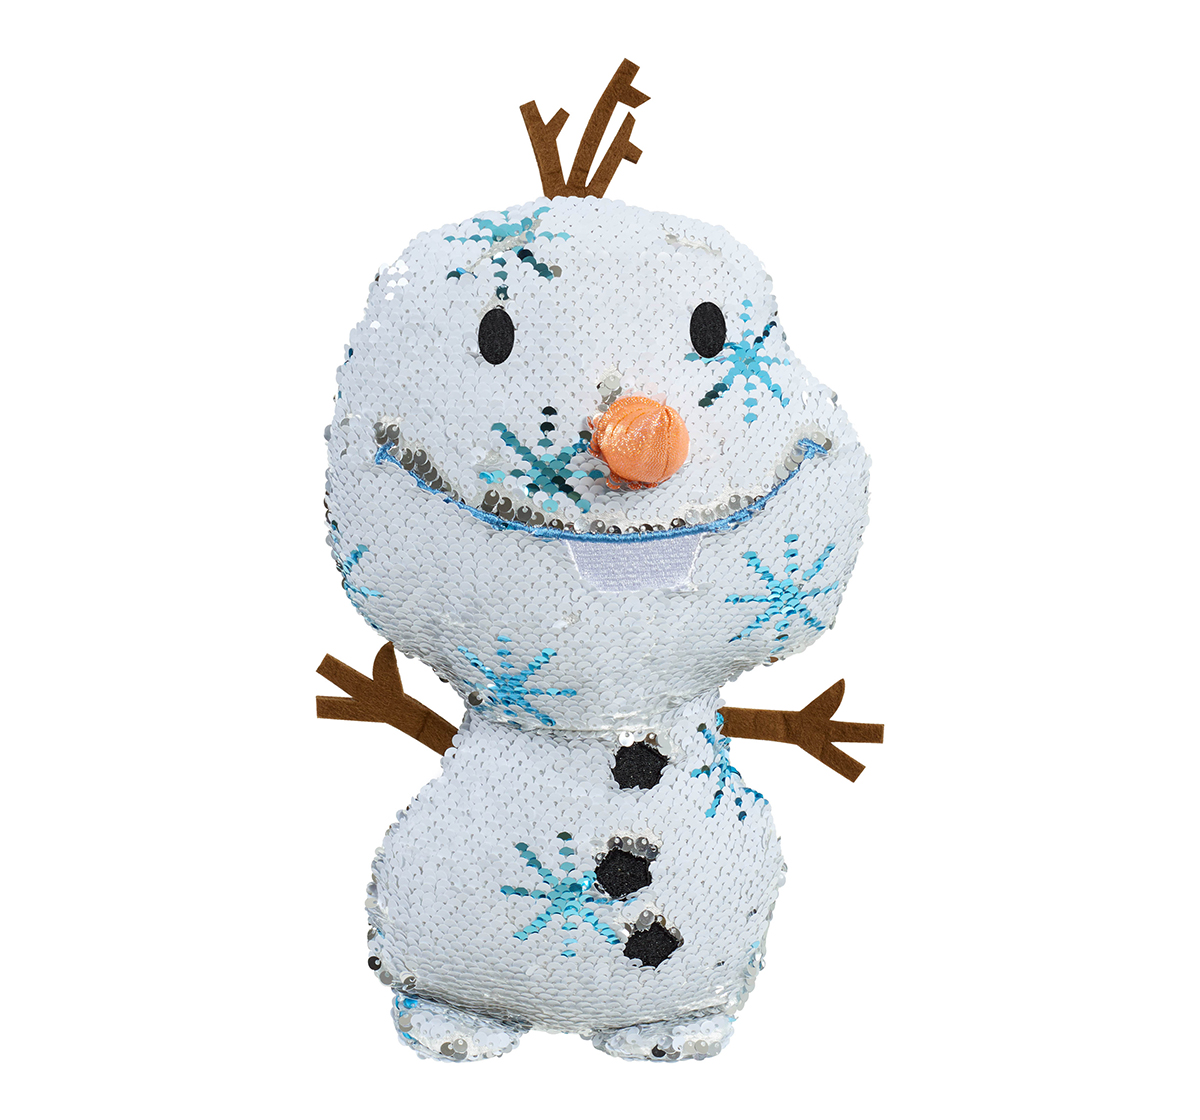 Disney   Disney Frozen2 Reversible Sequins Large Plush Character Soft Toys for Girls age 5Y+ - 30.48 Cm